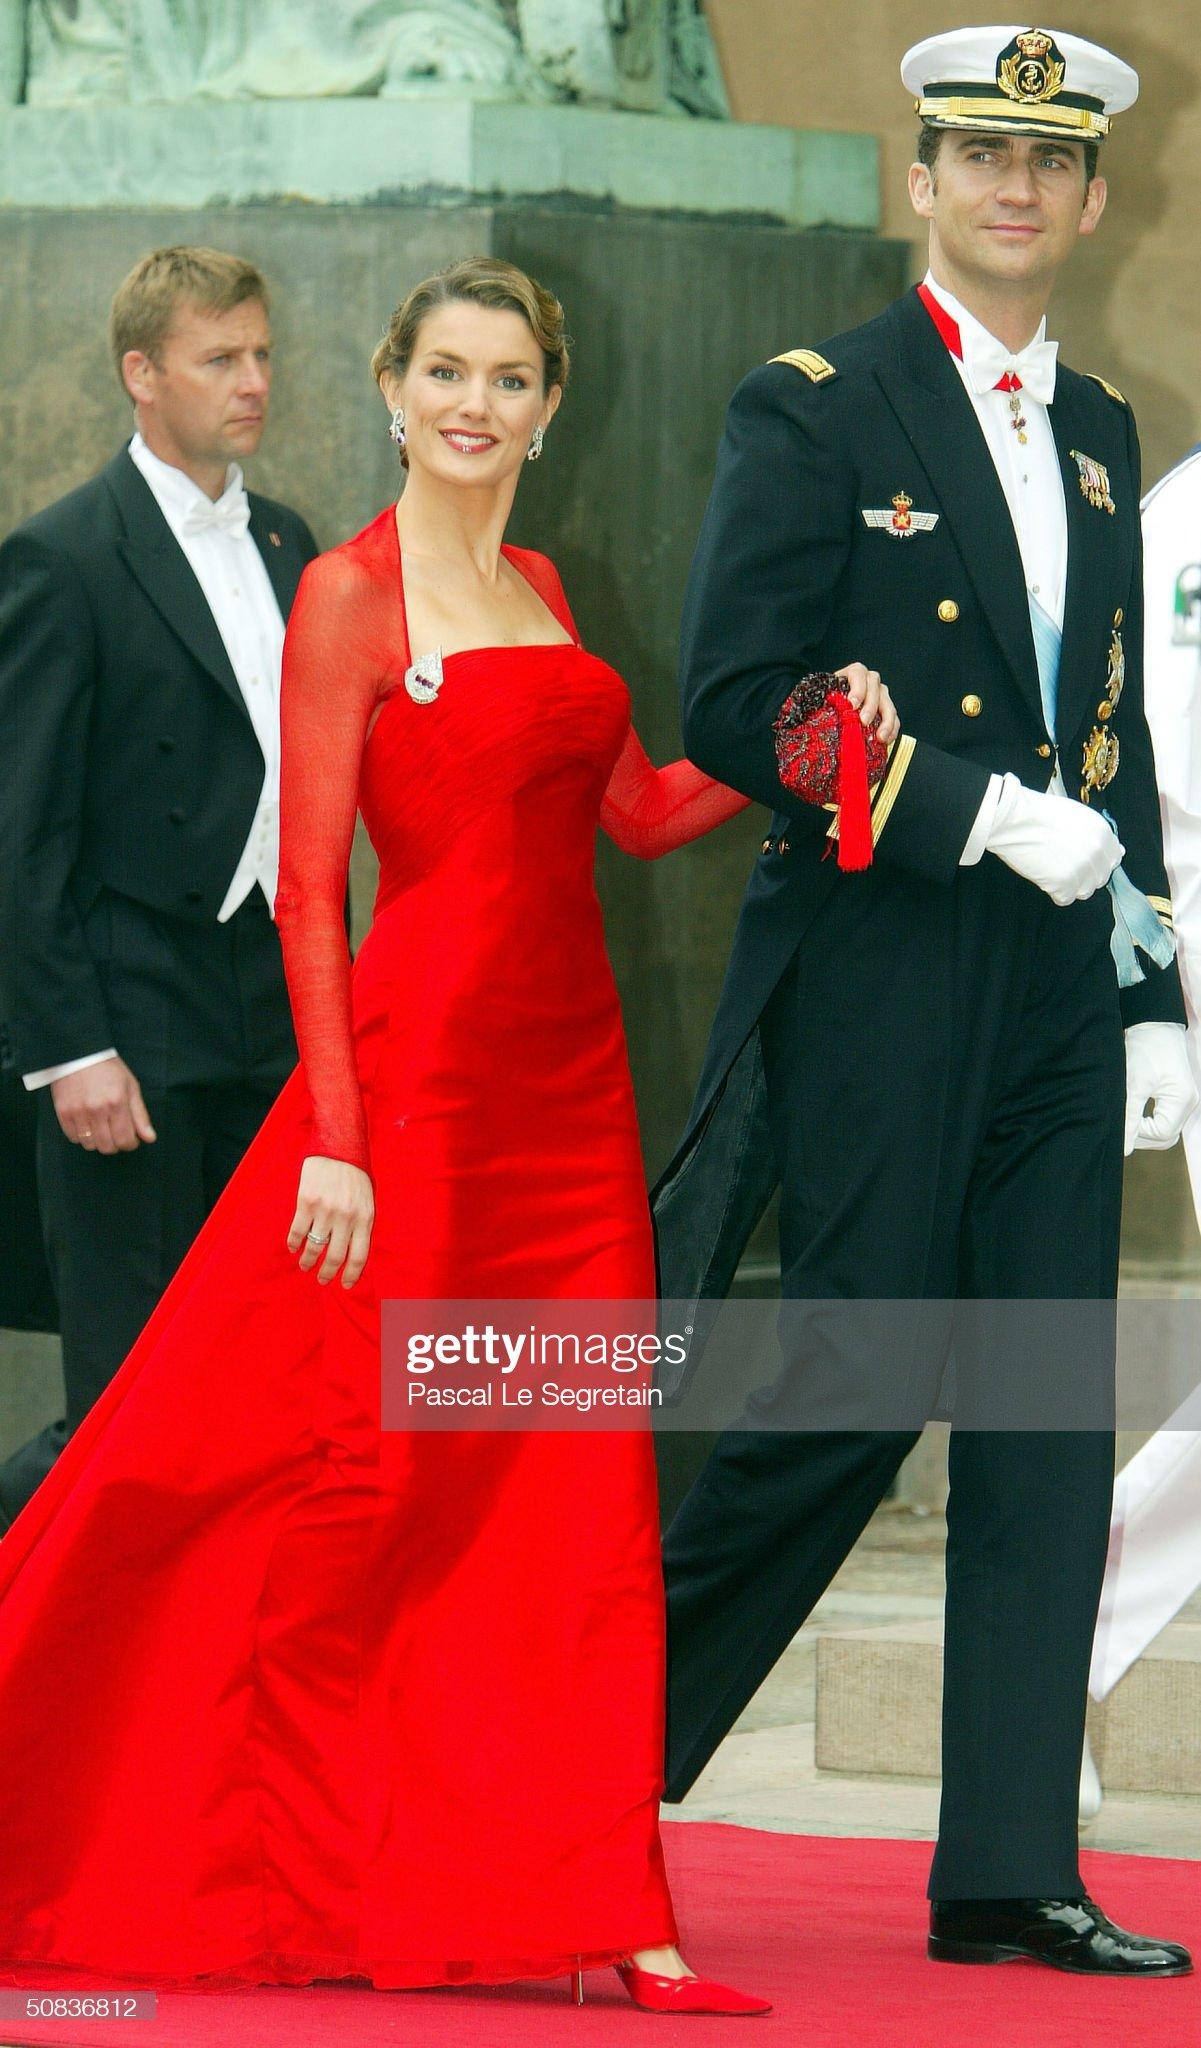 Вечерние наряды Королевы Летиции DK Wedding Of Danish Crown Prince Frederik and Mary Donaldson : News Photo